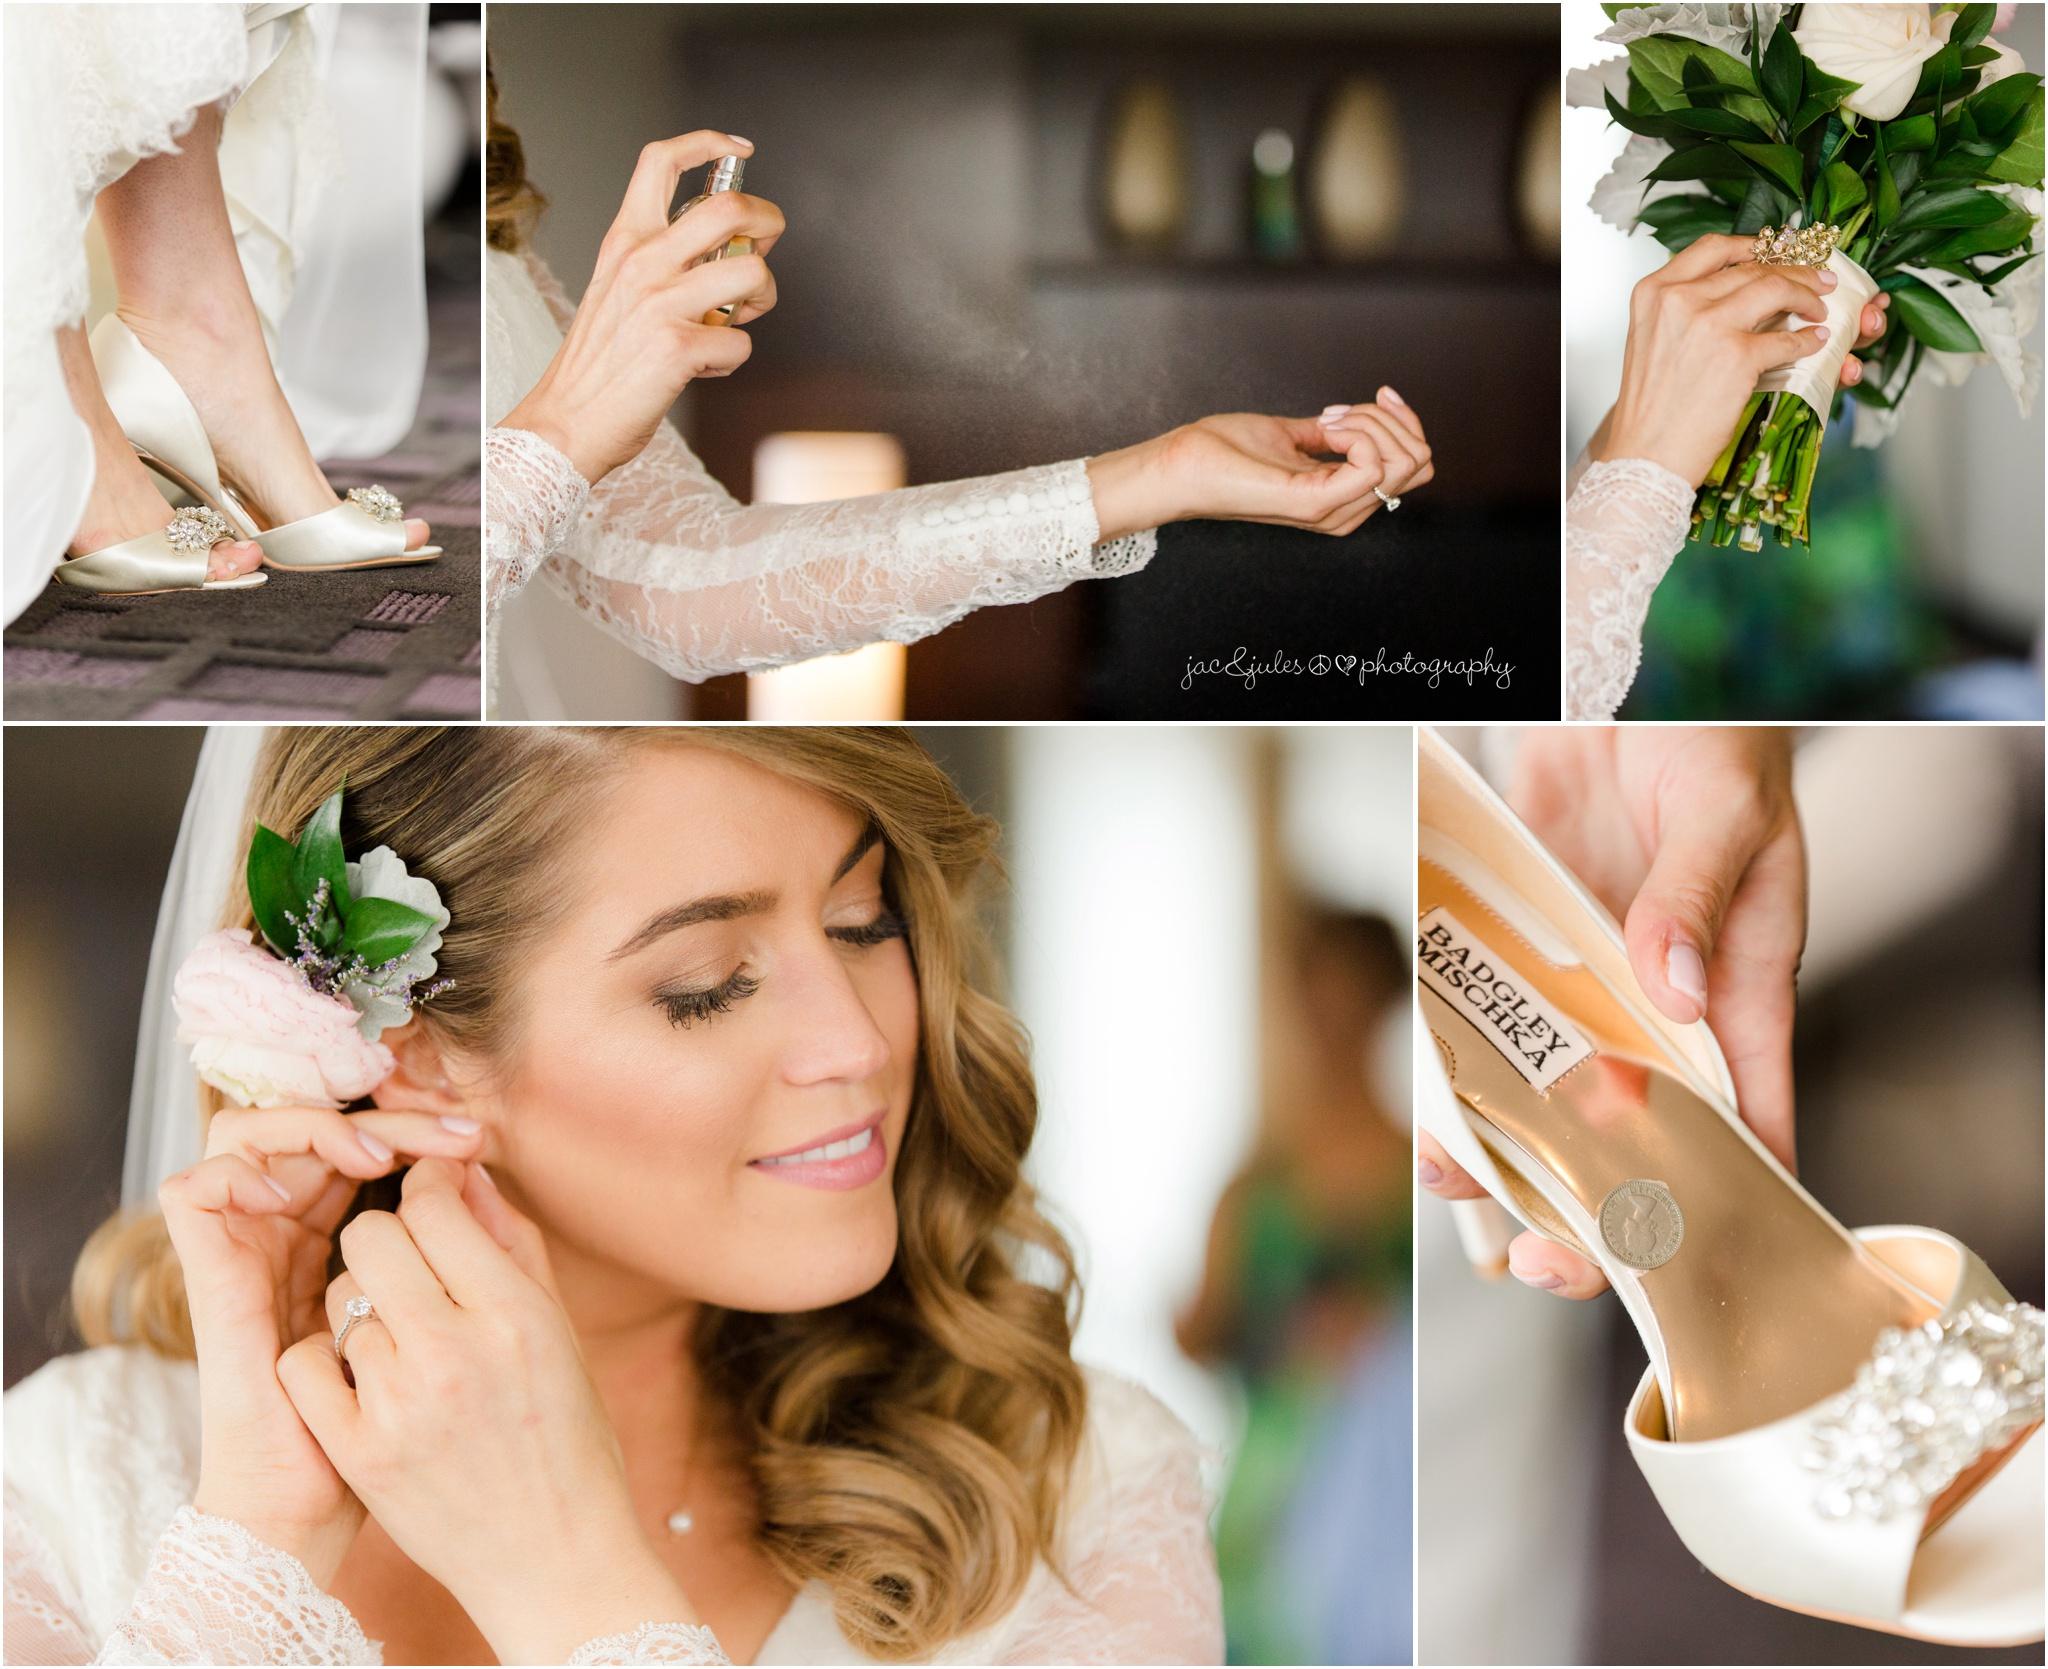 bride prep details, shoes, earrings, spraying perfume